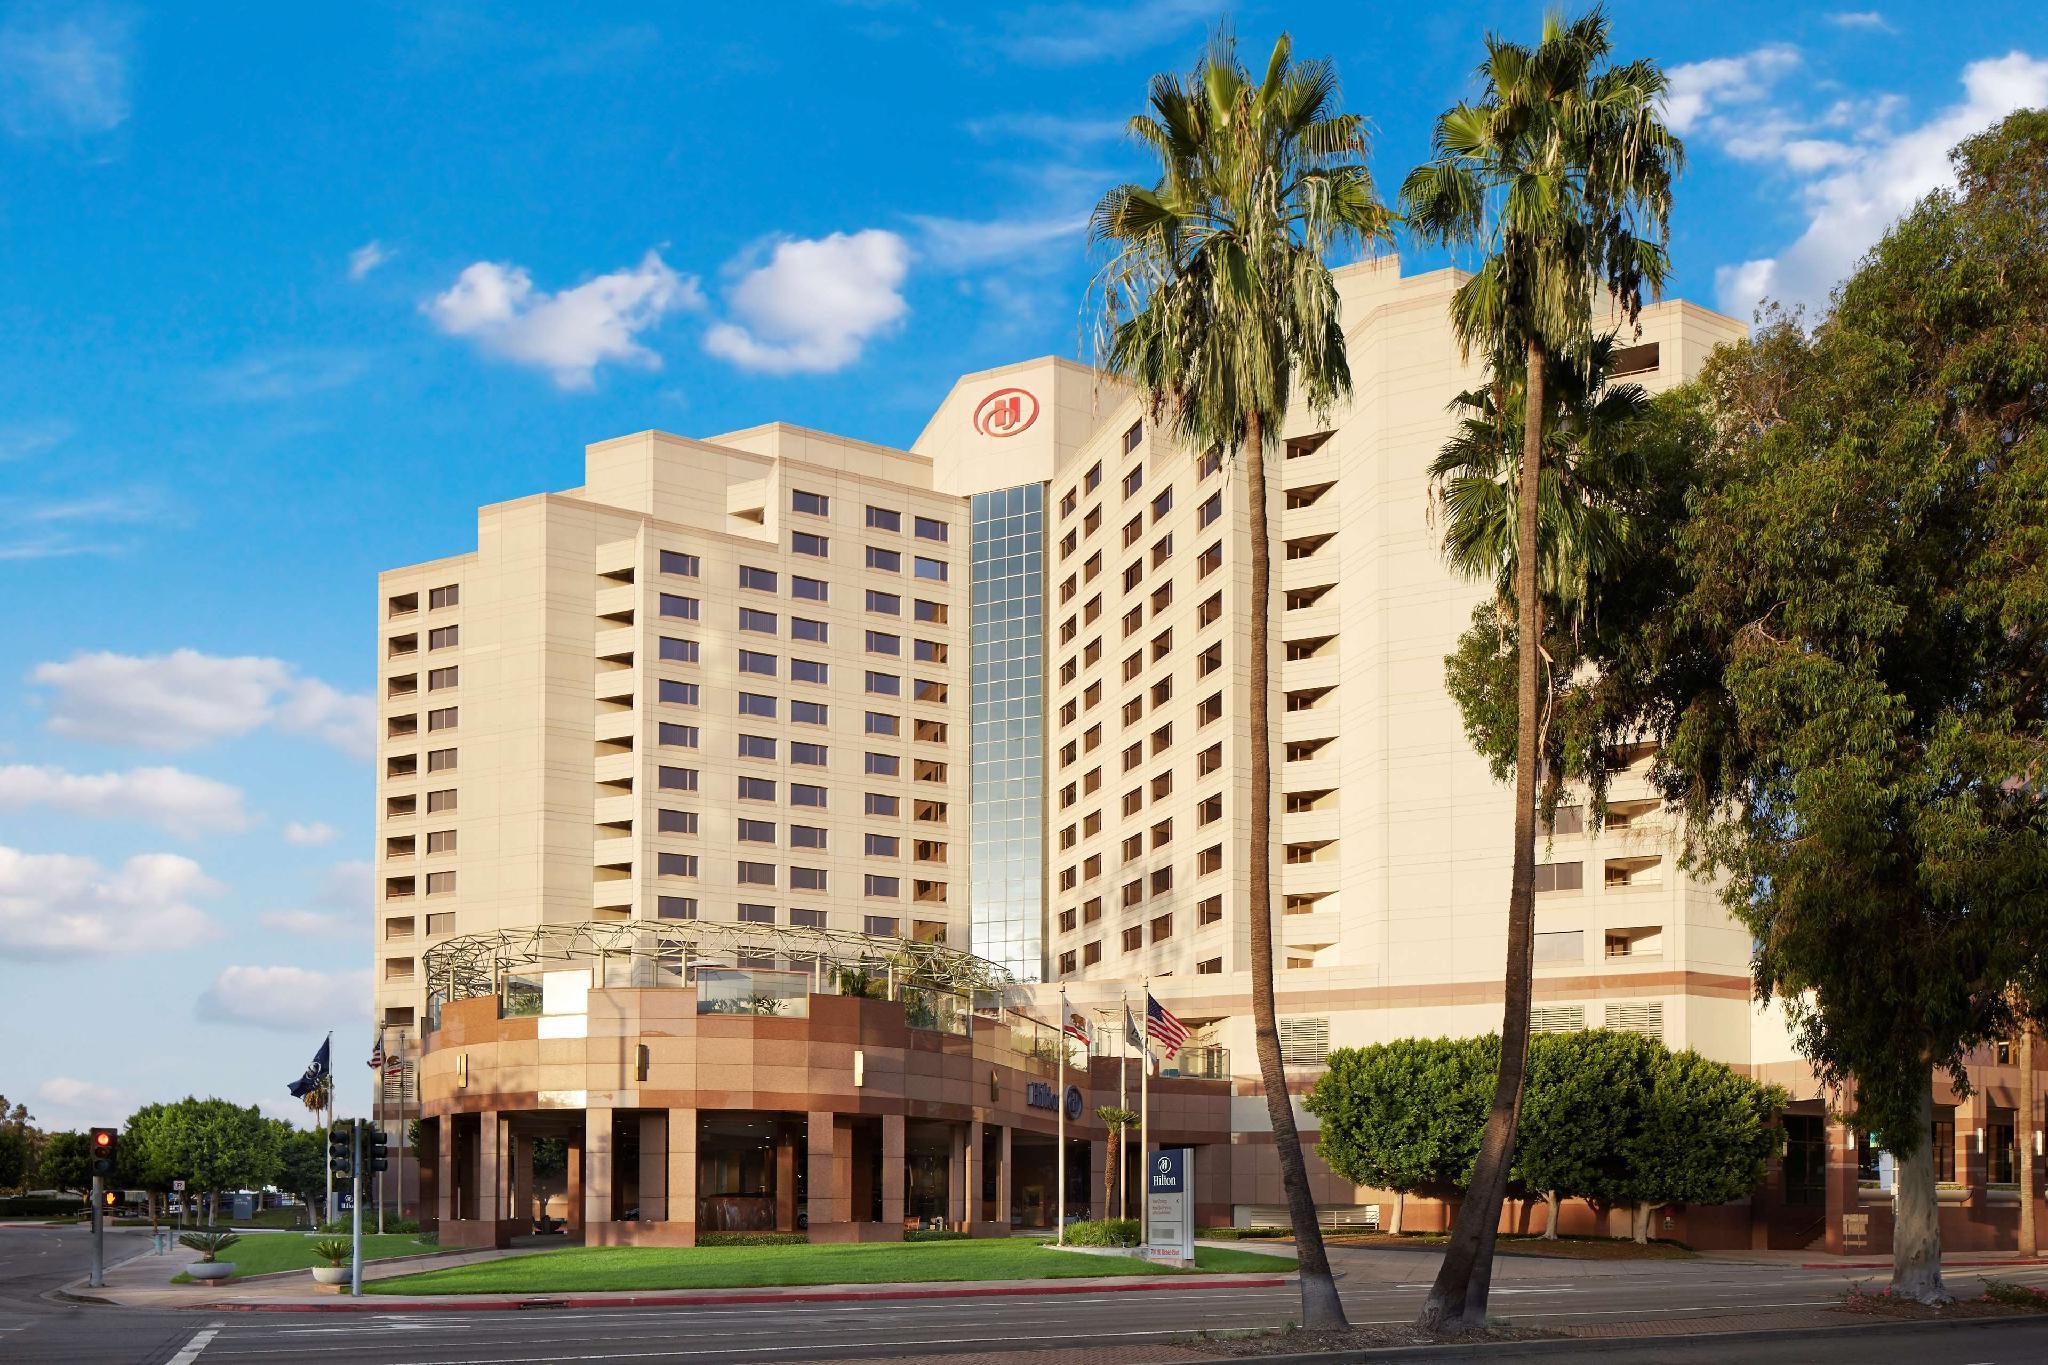 Hilton Long Beach image